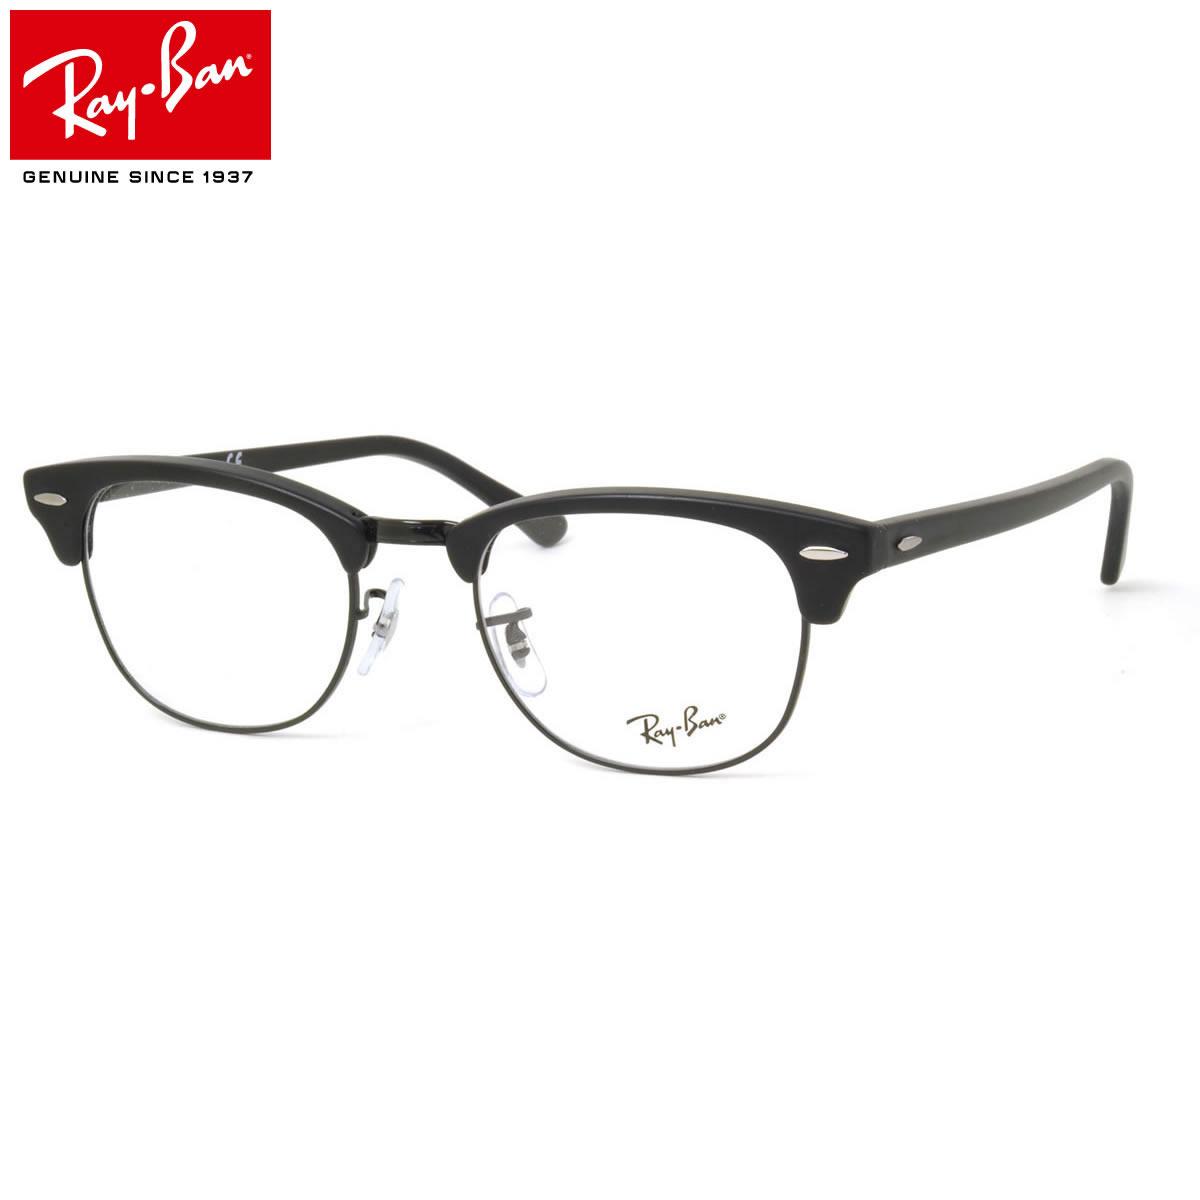 7e8e2f6c6 Ray-Ban glasses frame Ray-Ban RX5154 2077 51 size CLUB MASTER club master  ...